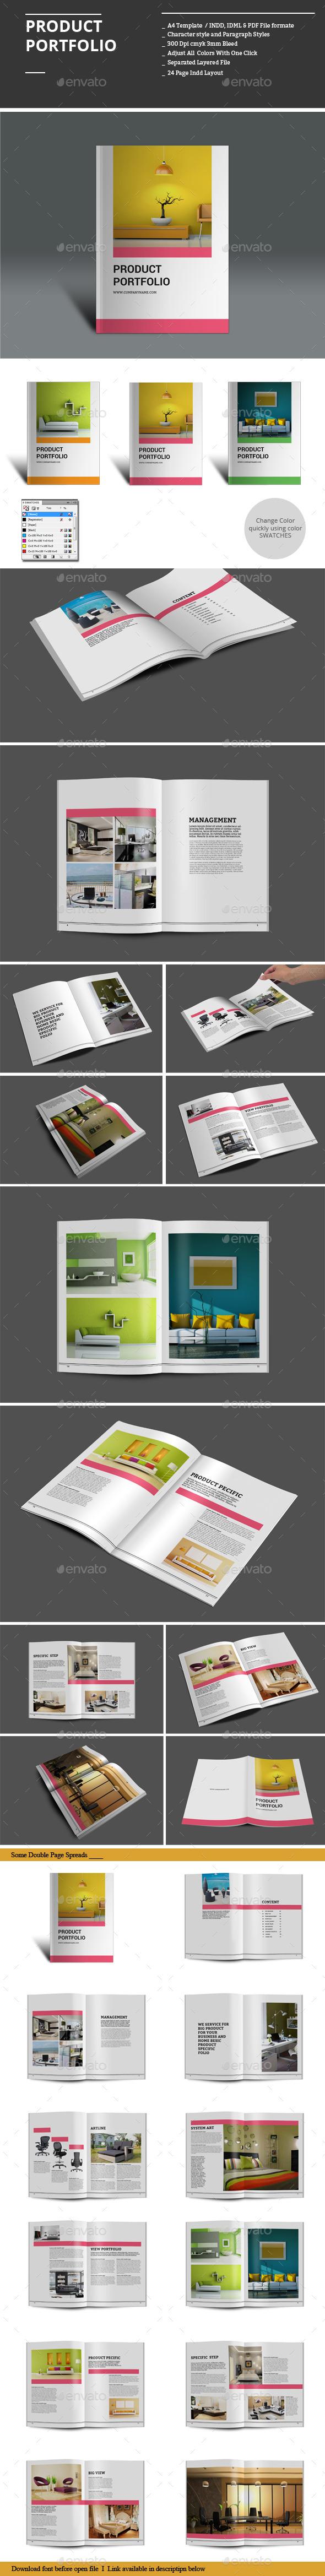 Product Portfolio - Portfolio Brochures